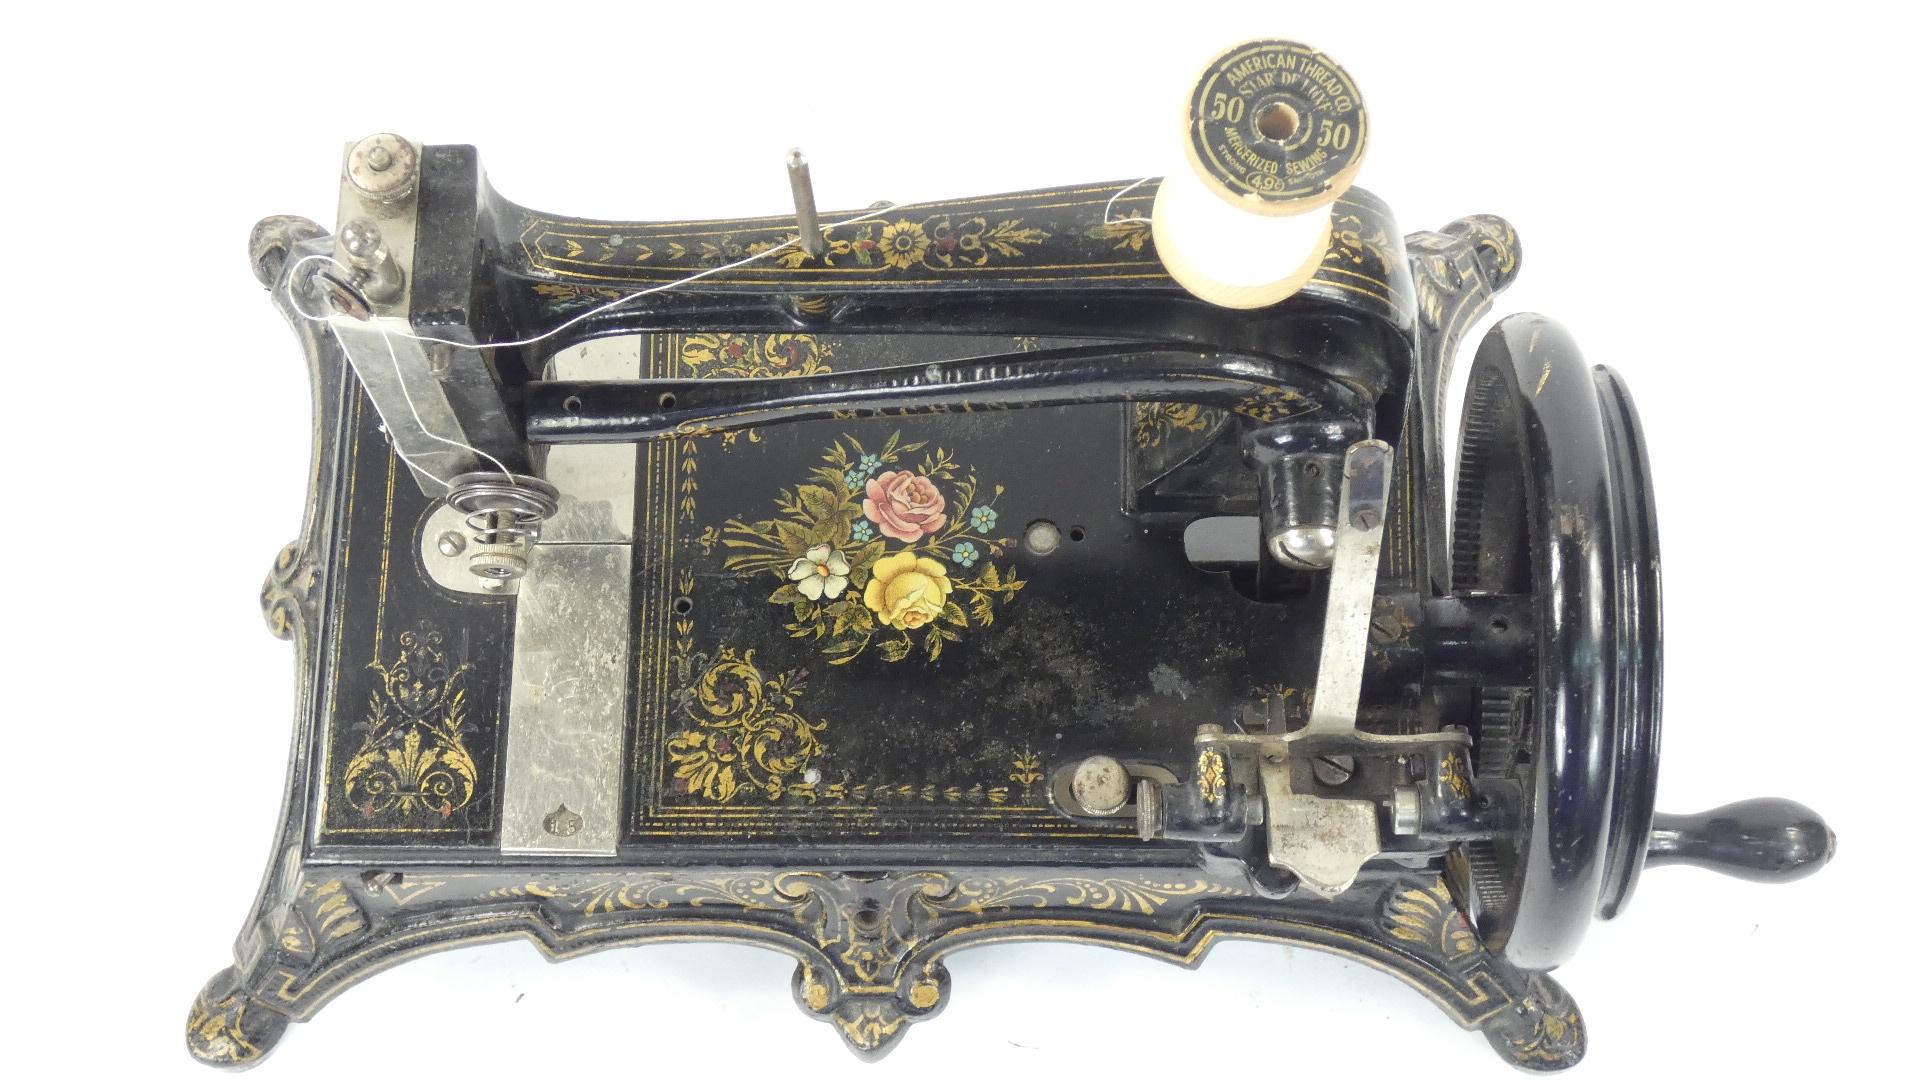 Imagen RARA TITTEL & NIES, ALEMANIA 1885 43341